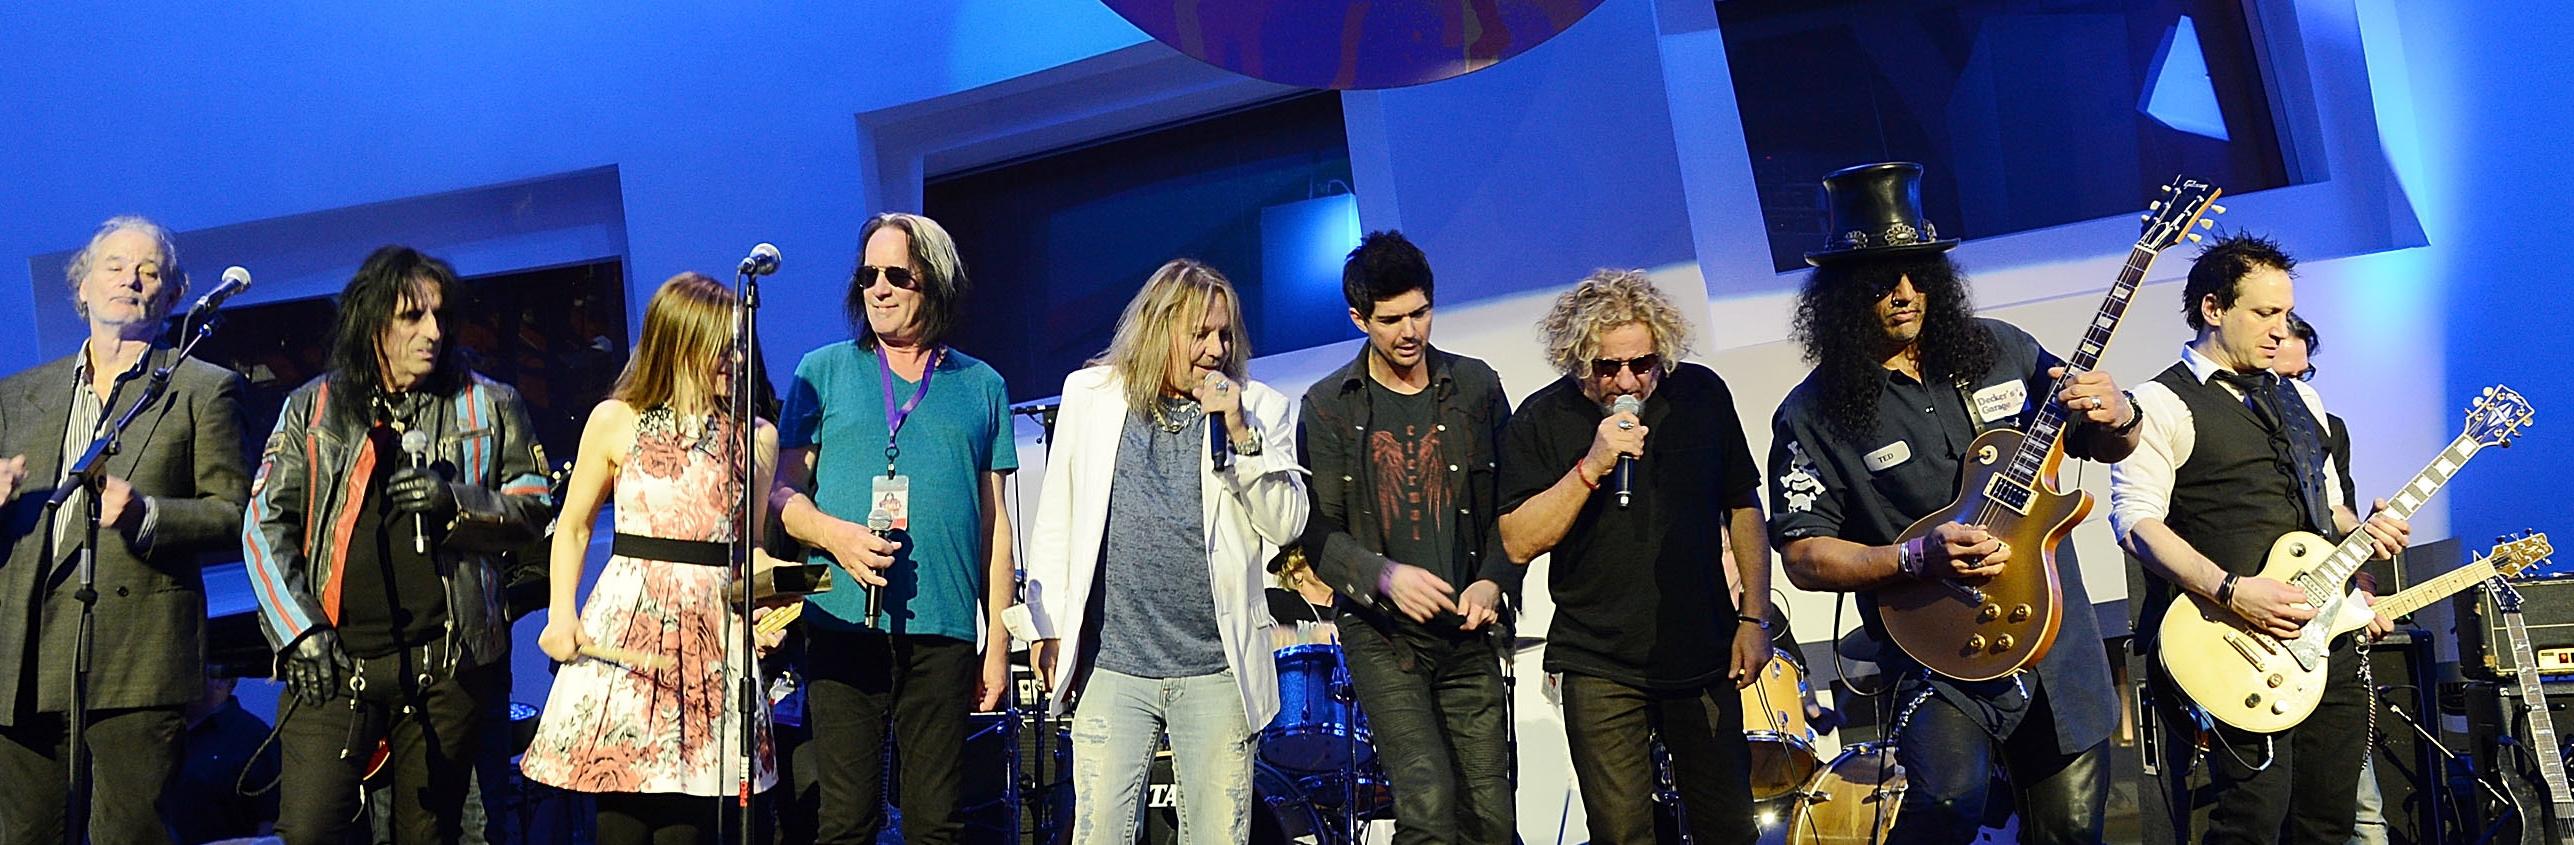 Slash, Alice Cooper, Vince Neil